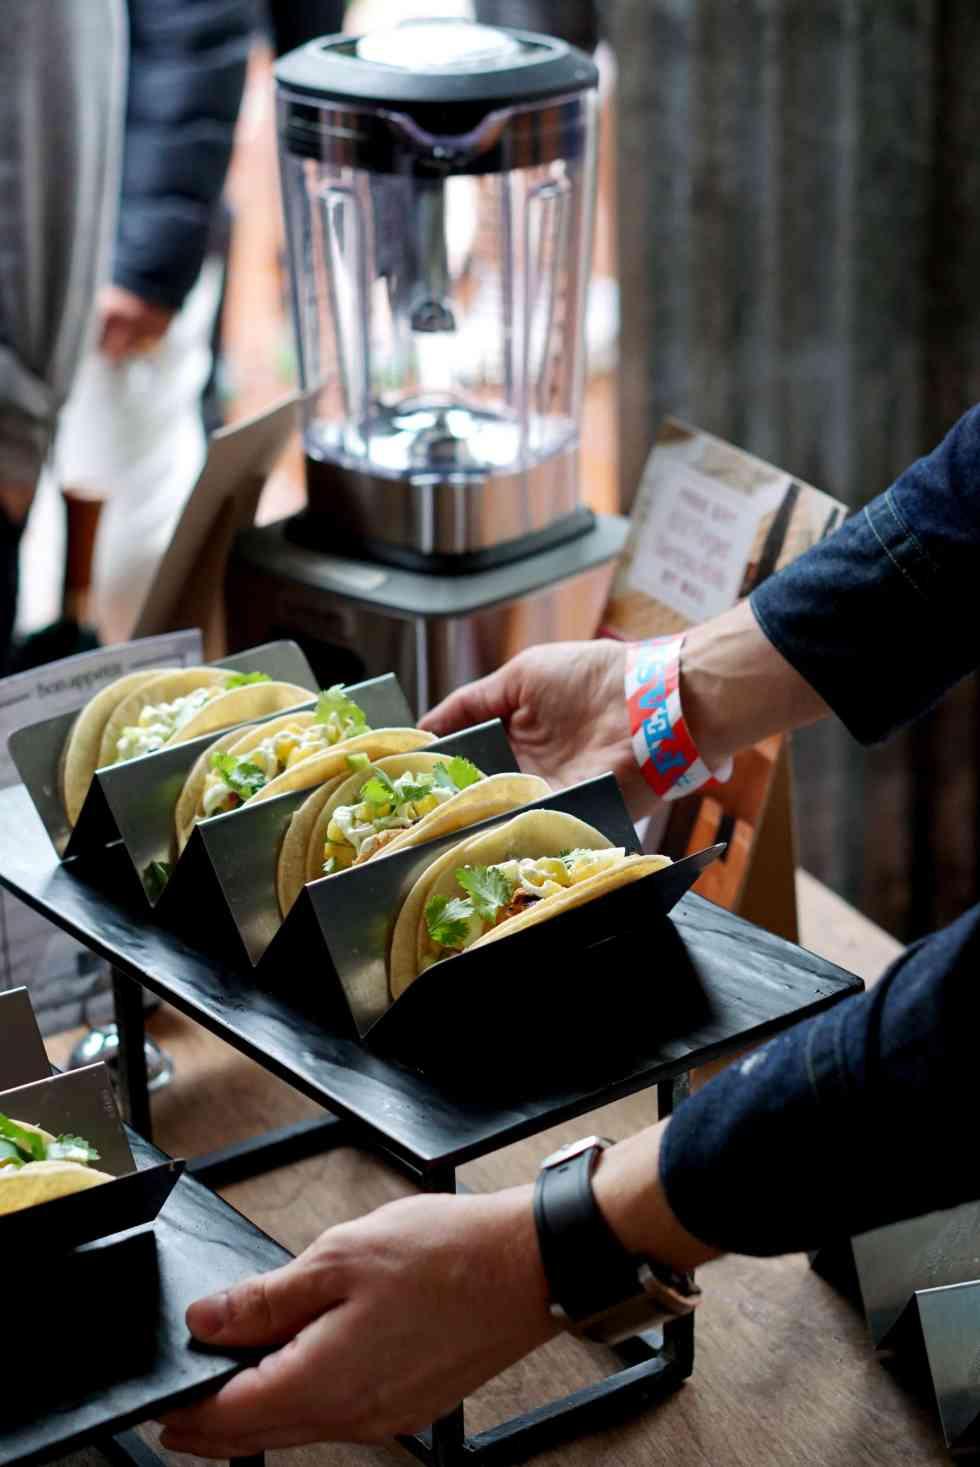 wolf-gourmet-blender-lenaskitchenblog_tacos3